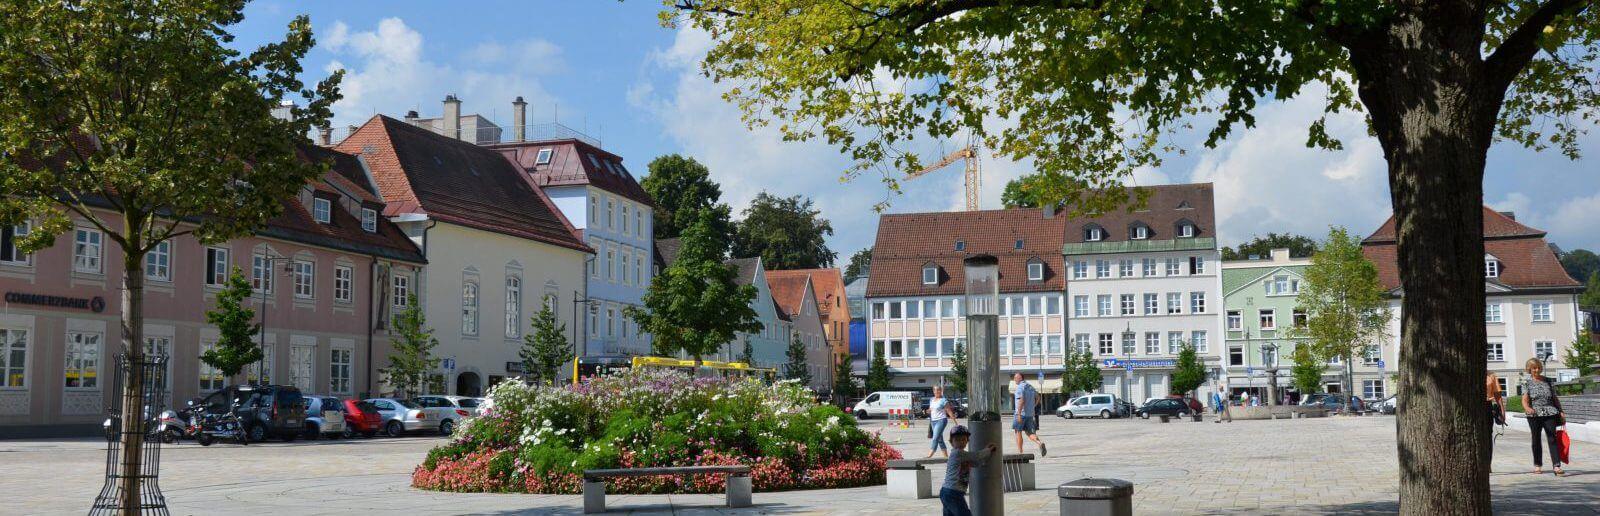 Ferienwohungen in Kempten bei Claudia Dress (Telefon: 0831/ 570907)